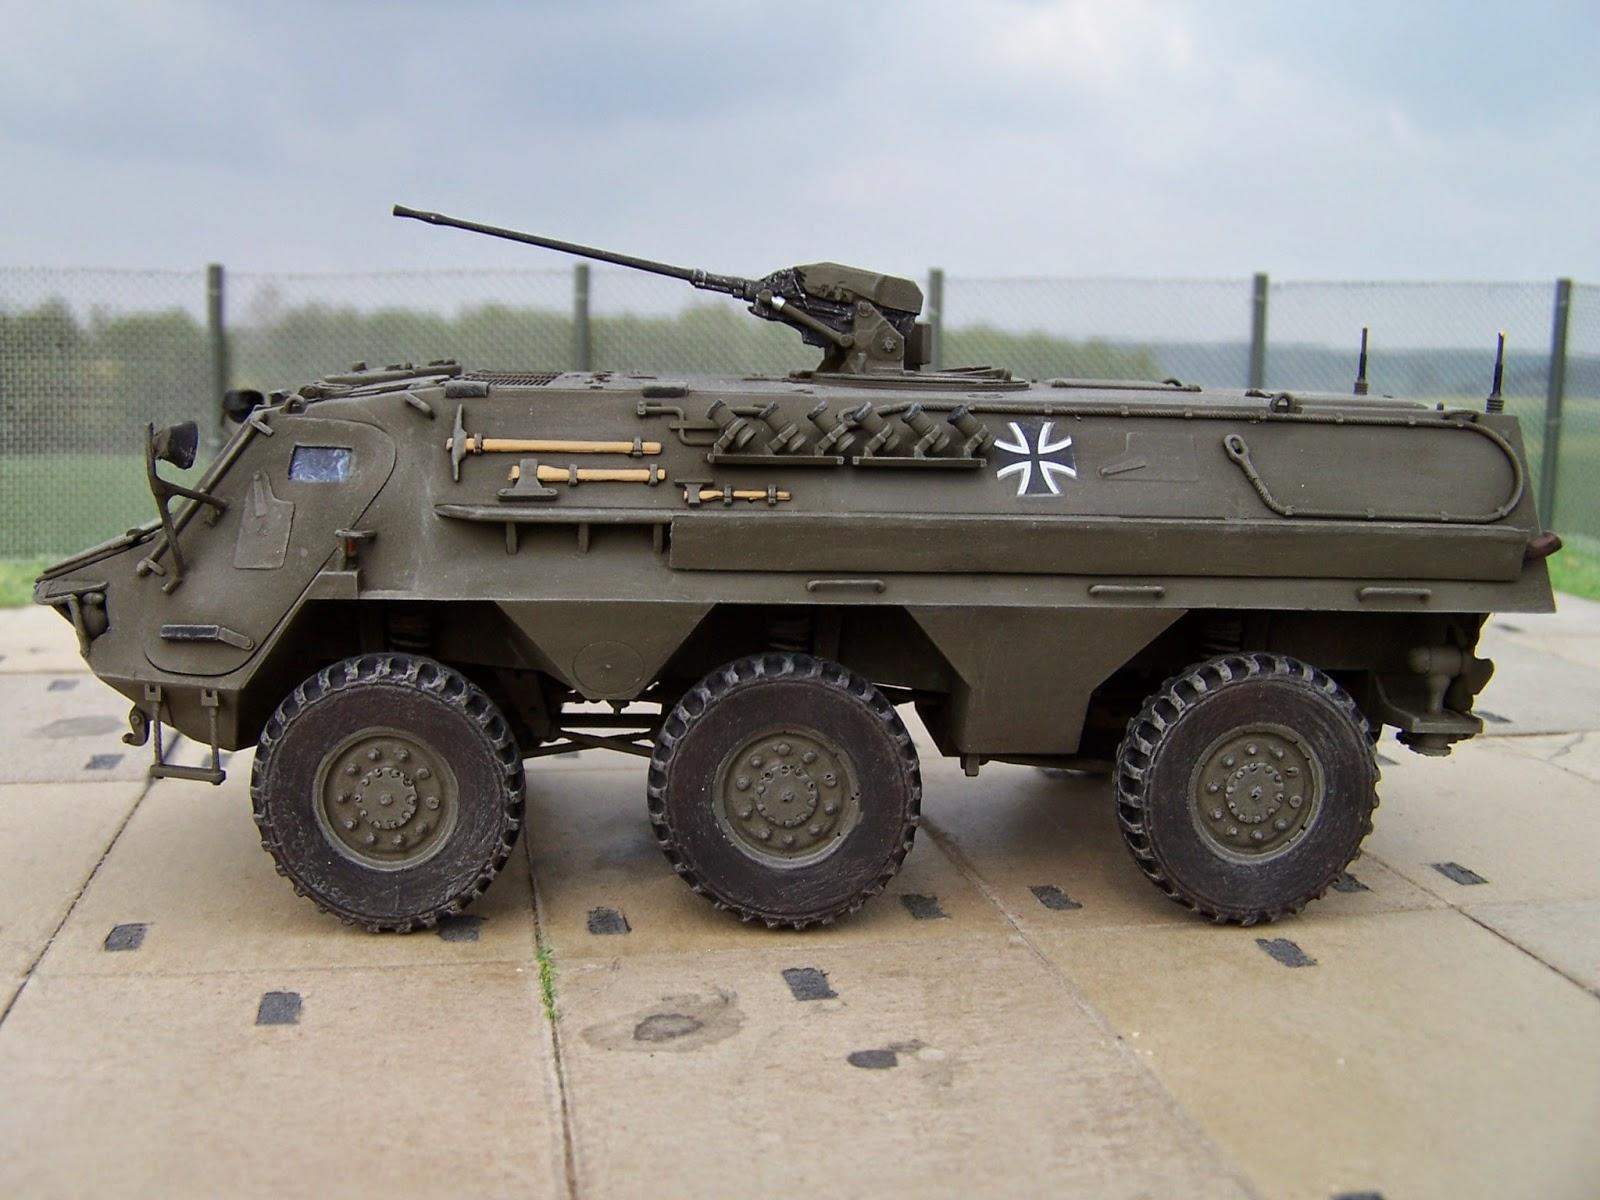 Fuchs Radpanzer